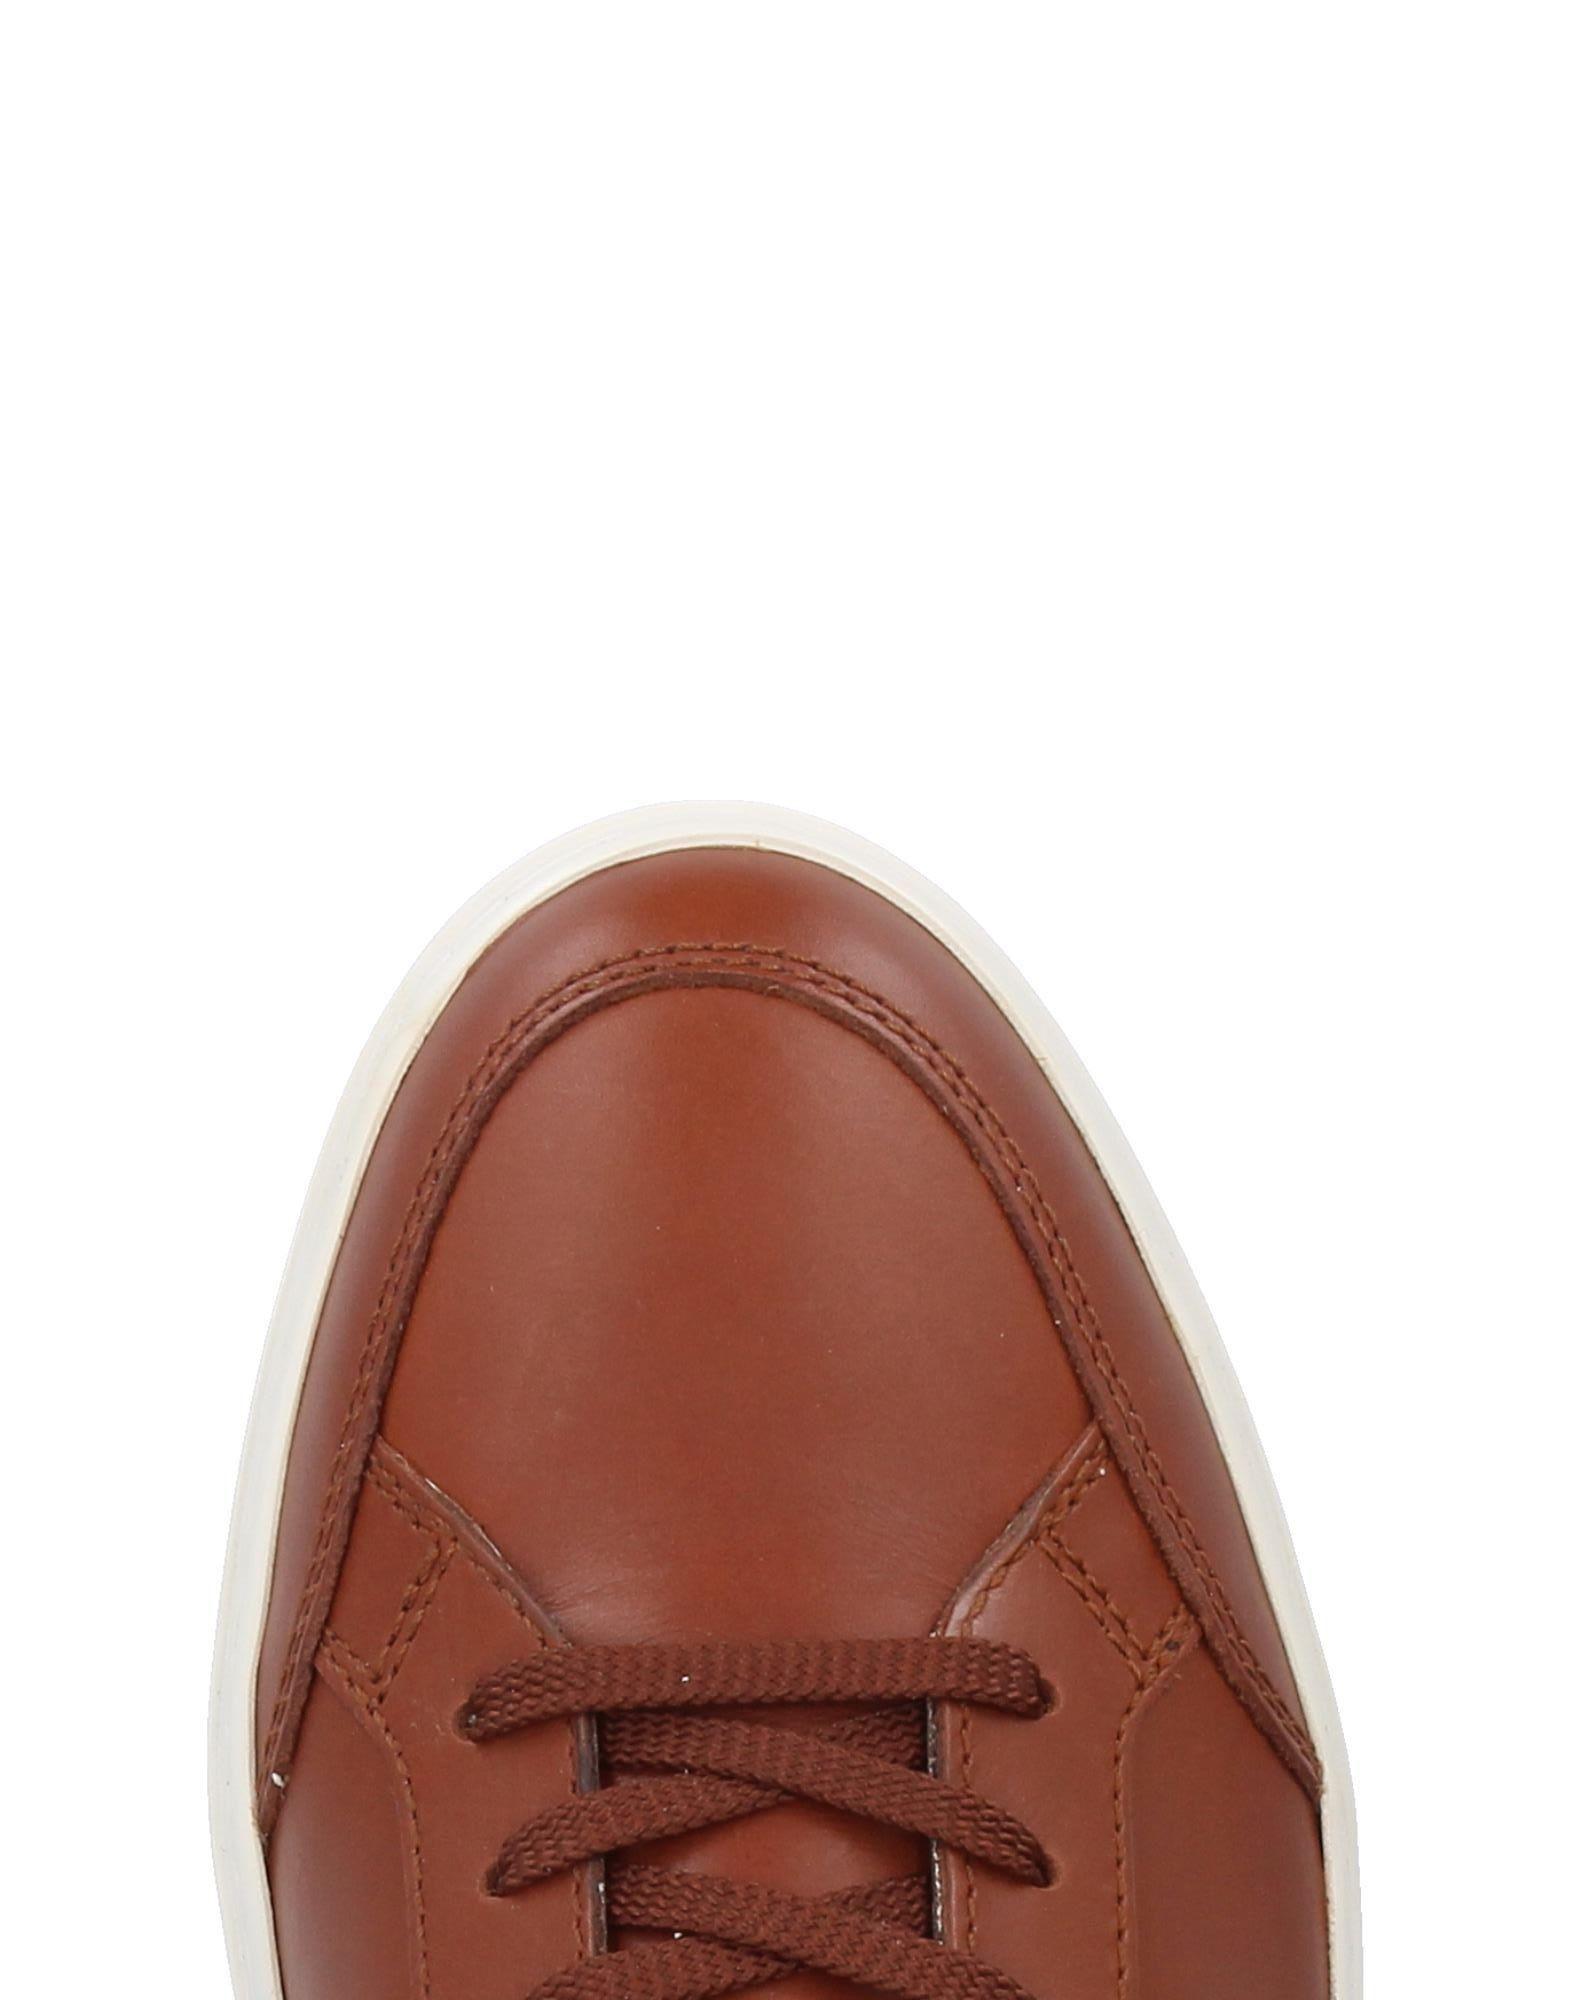 11413104NF Tod's Sneakers Herren  11413104NF  a32f70